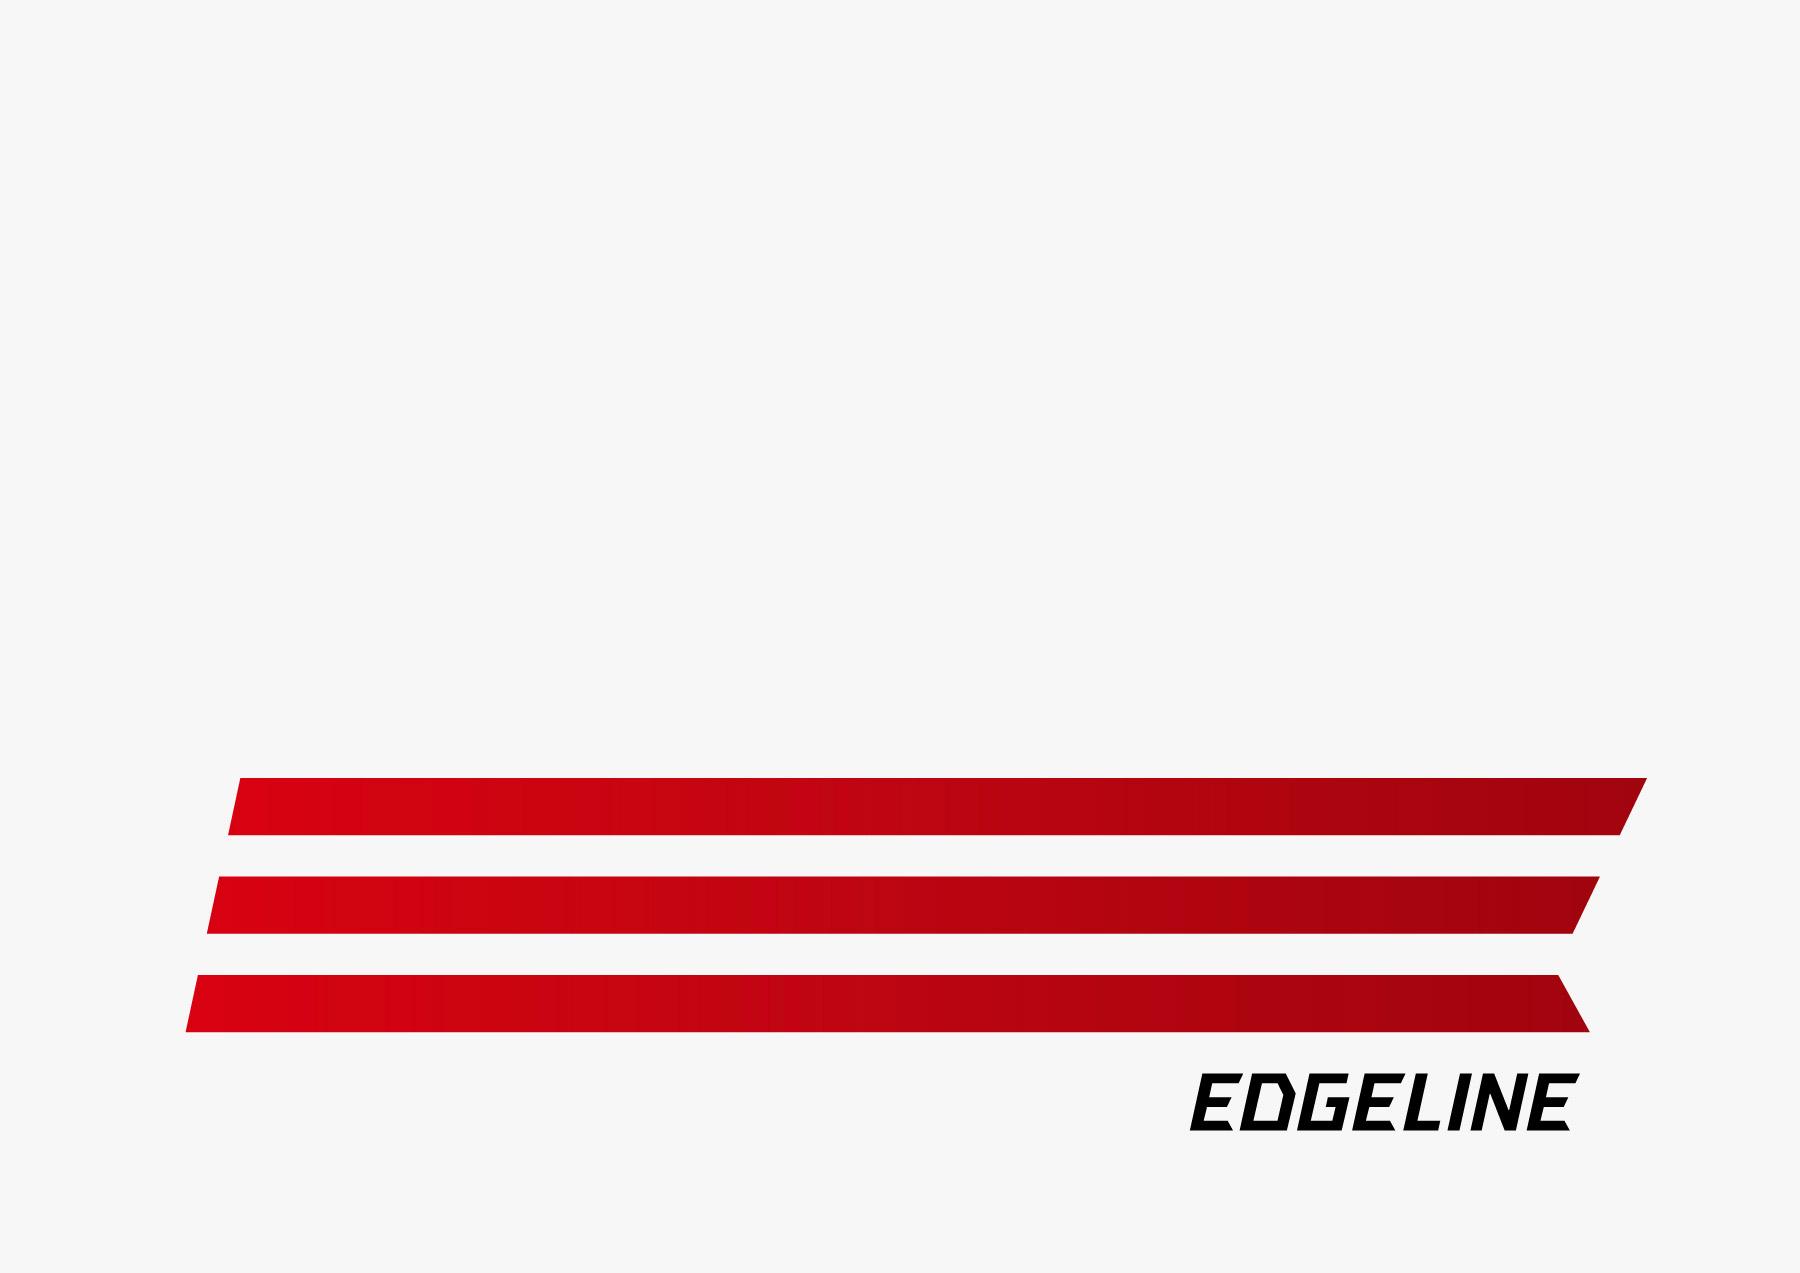 EDGELINE CI   STUDIO WONDER